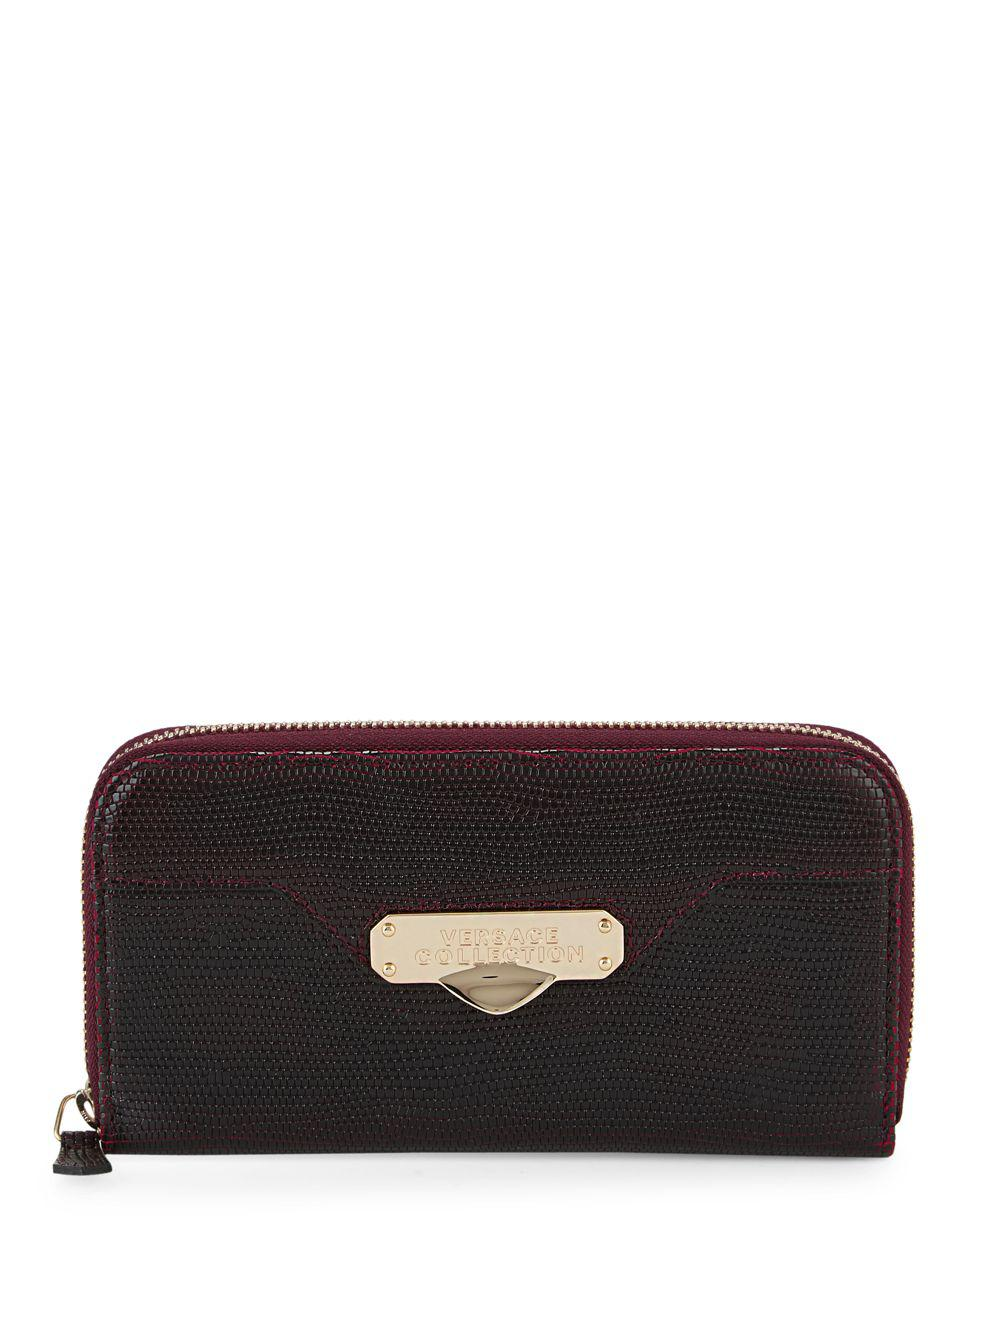 45935872be Lyst - Versace Textured Leather Zip-around Wallet in Black